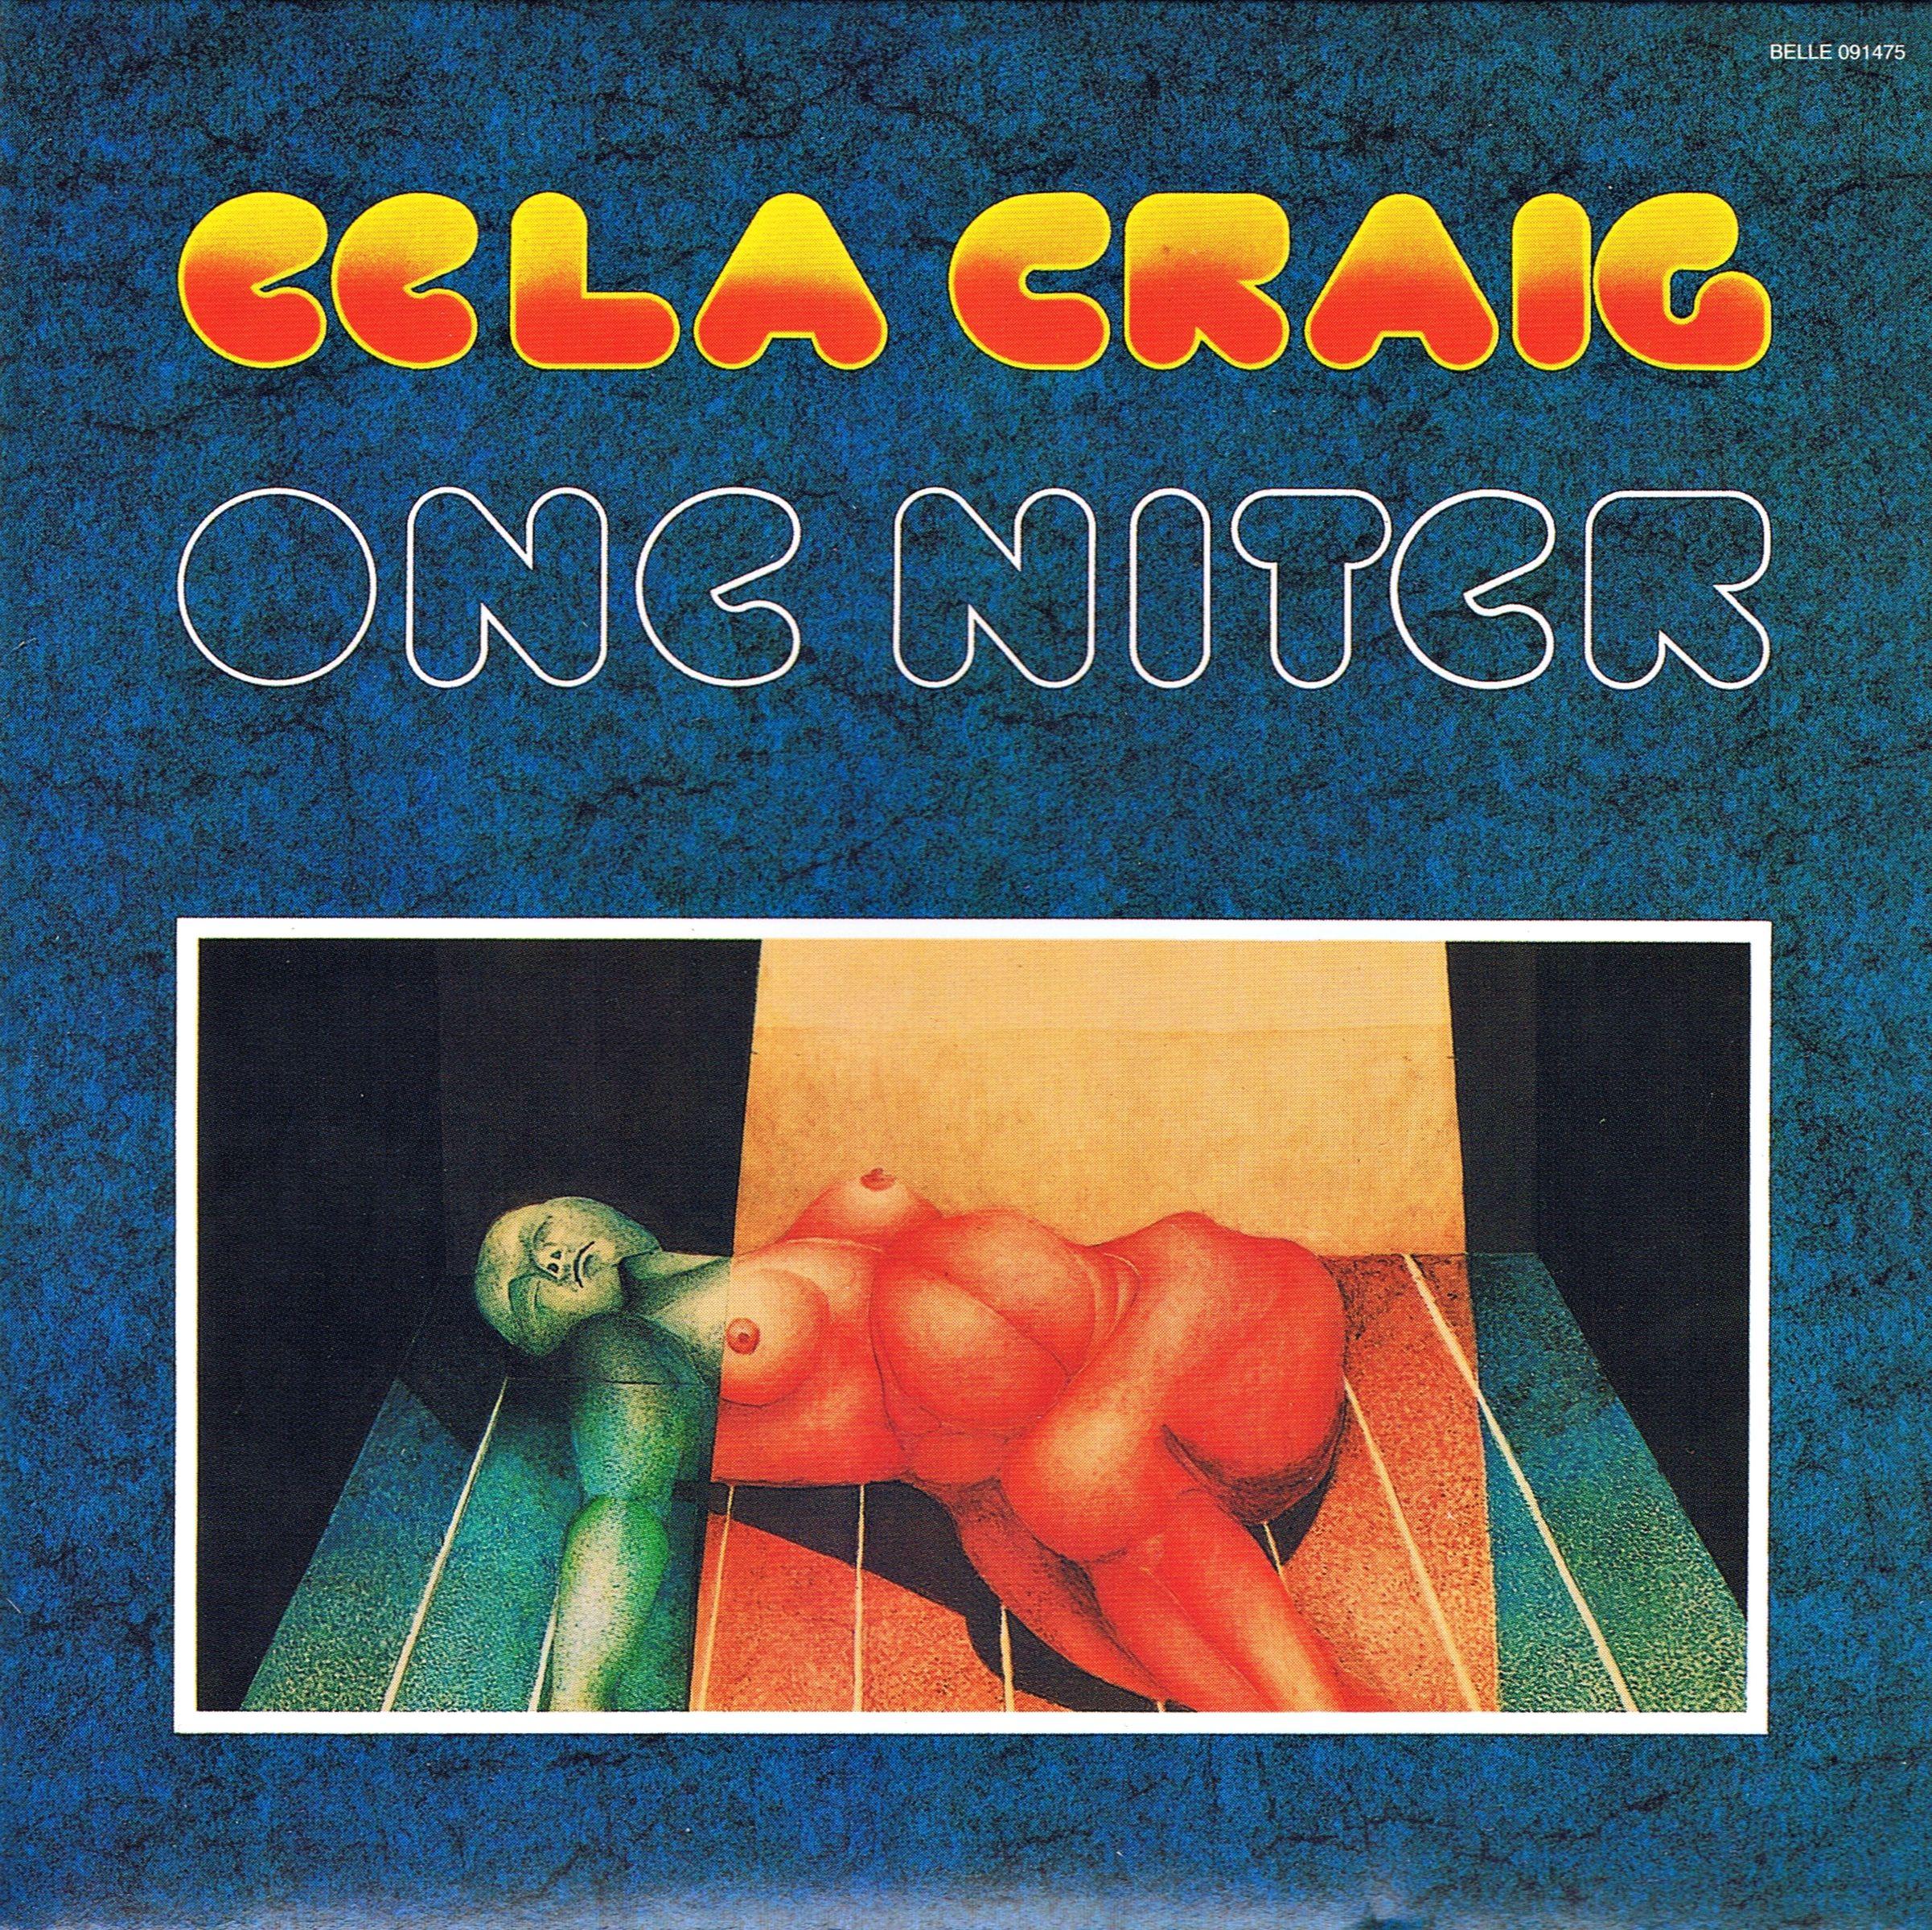 Eela Craig - One Niter